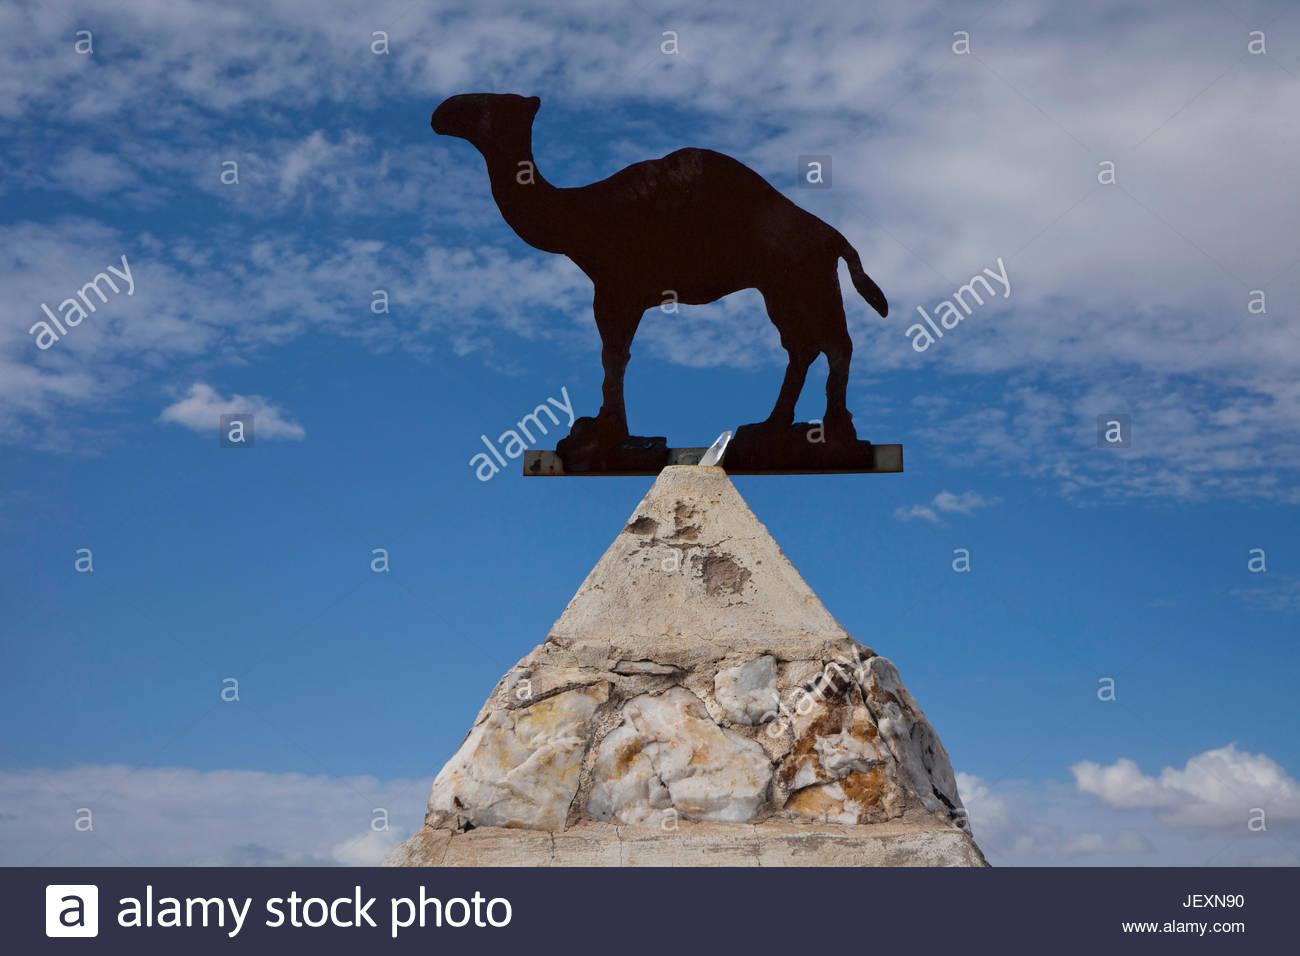 Un monumento en un cementerio a Hi Jolly, un sirio nacido camello herder que fue contratado para administrar el Imagen De Stock